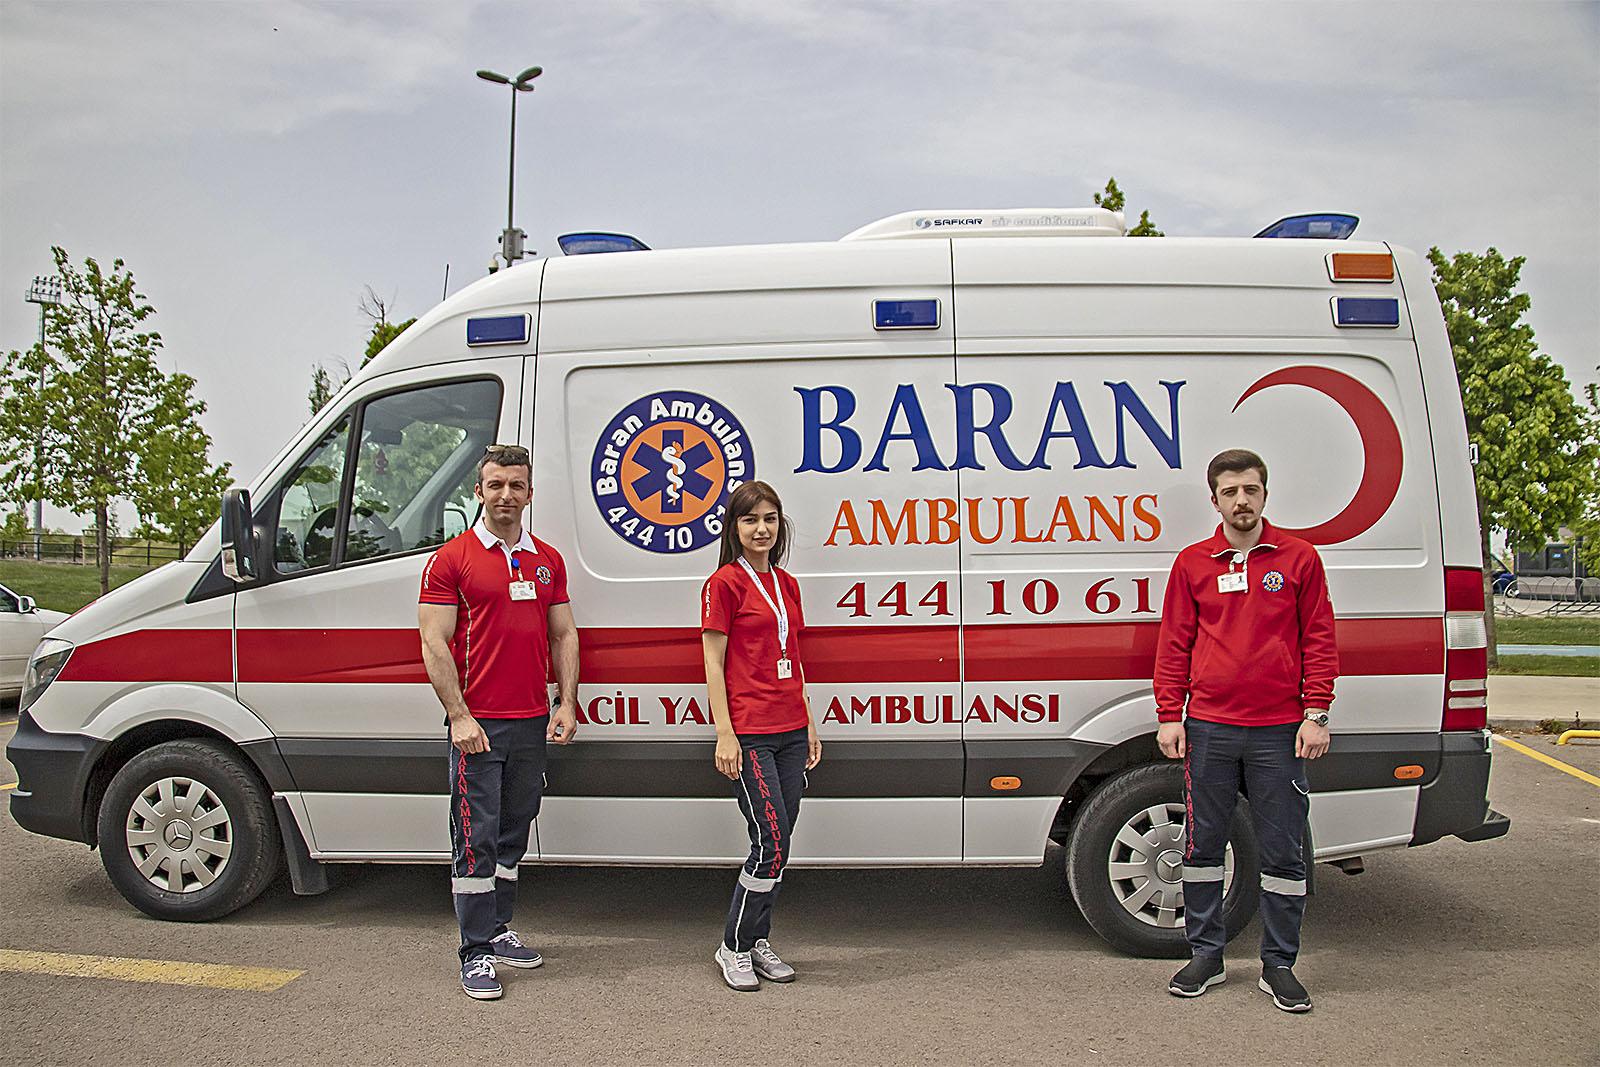 baran ambulans insan kaynakları